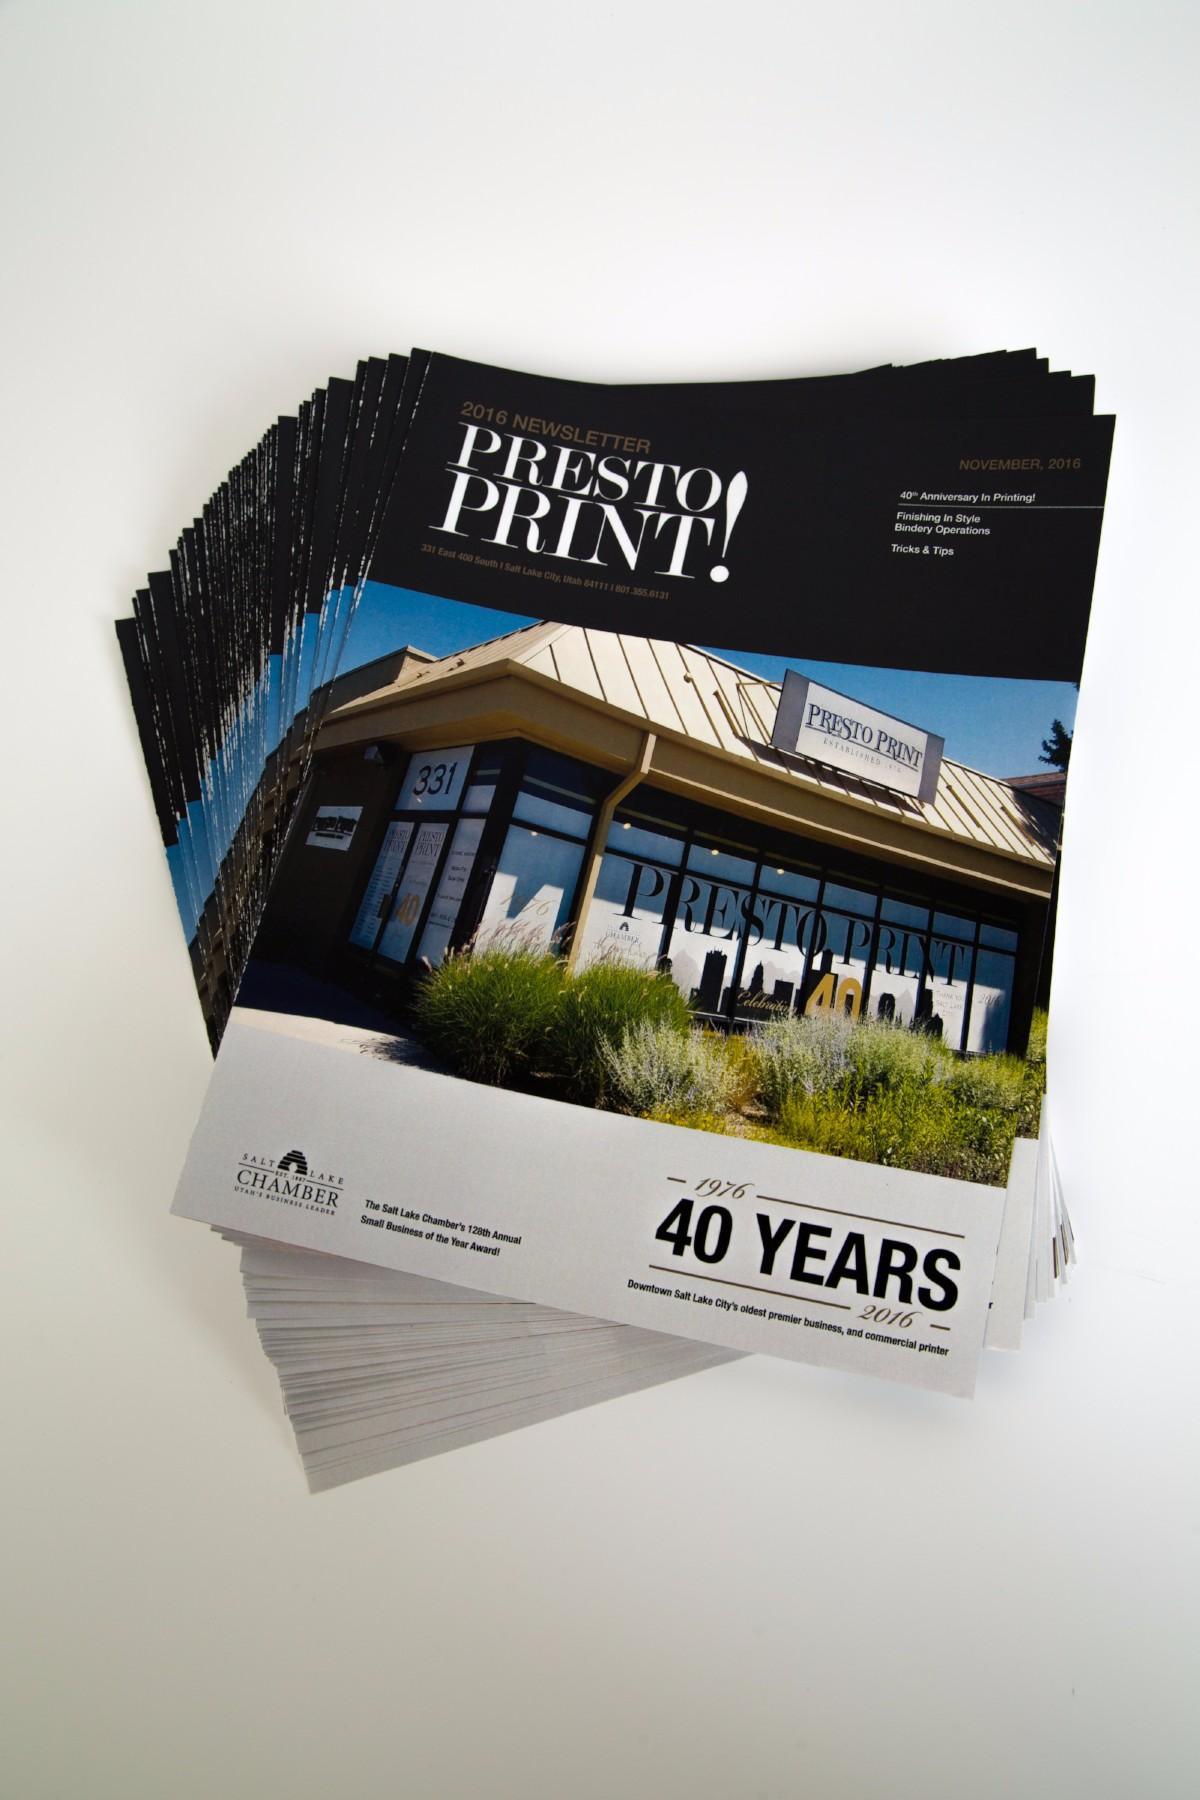 Printing Business in Salt Lake City